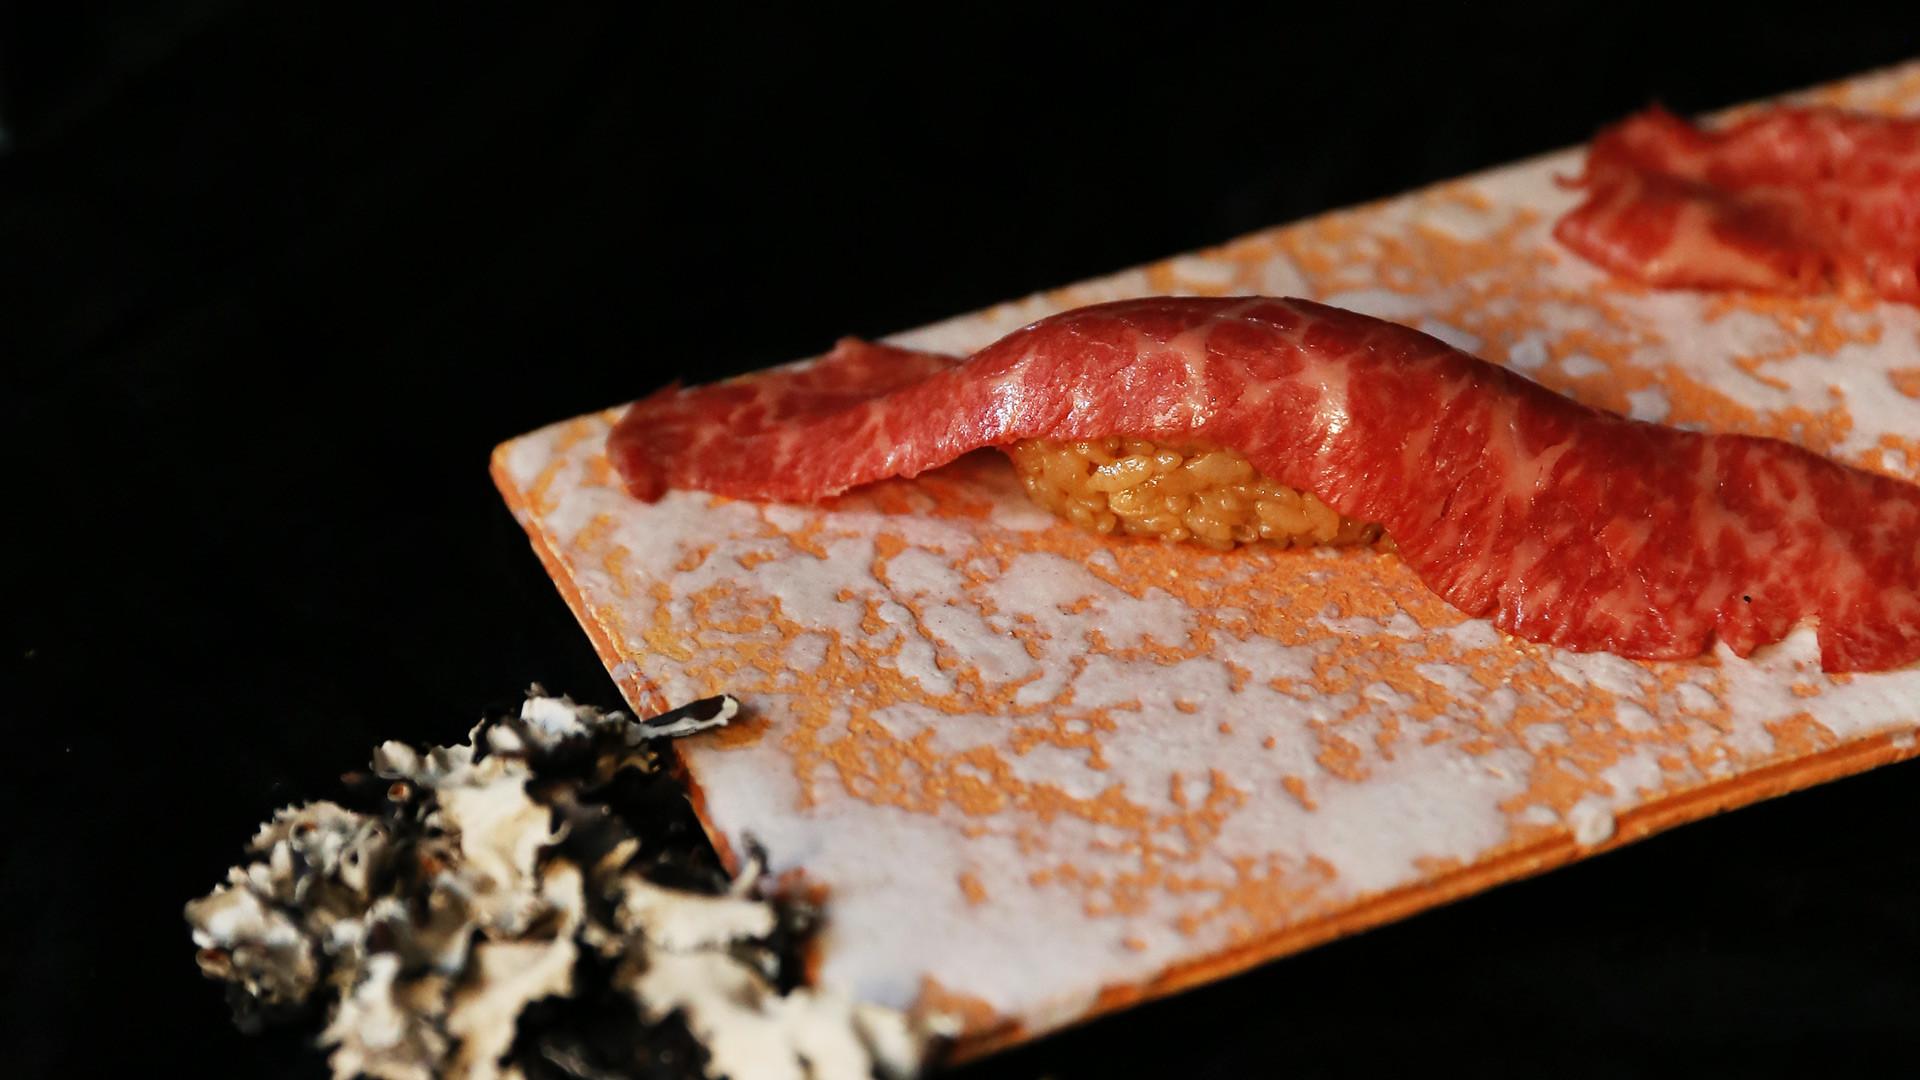 Sushi types and how to eat sushi | Wagyu beef nigiri at Minami Toronto on King West